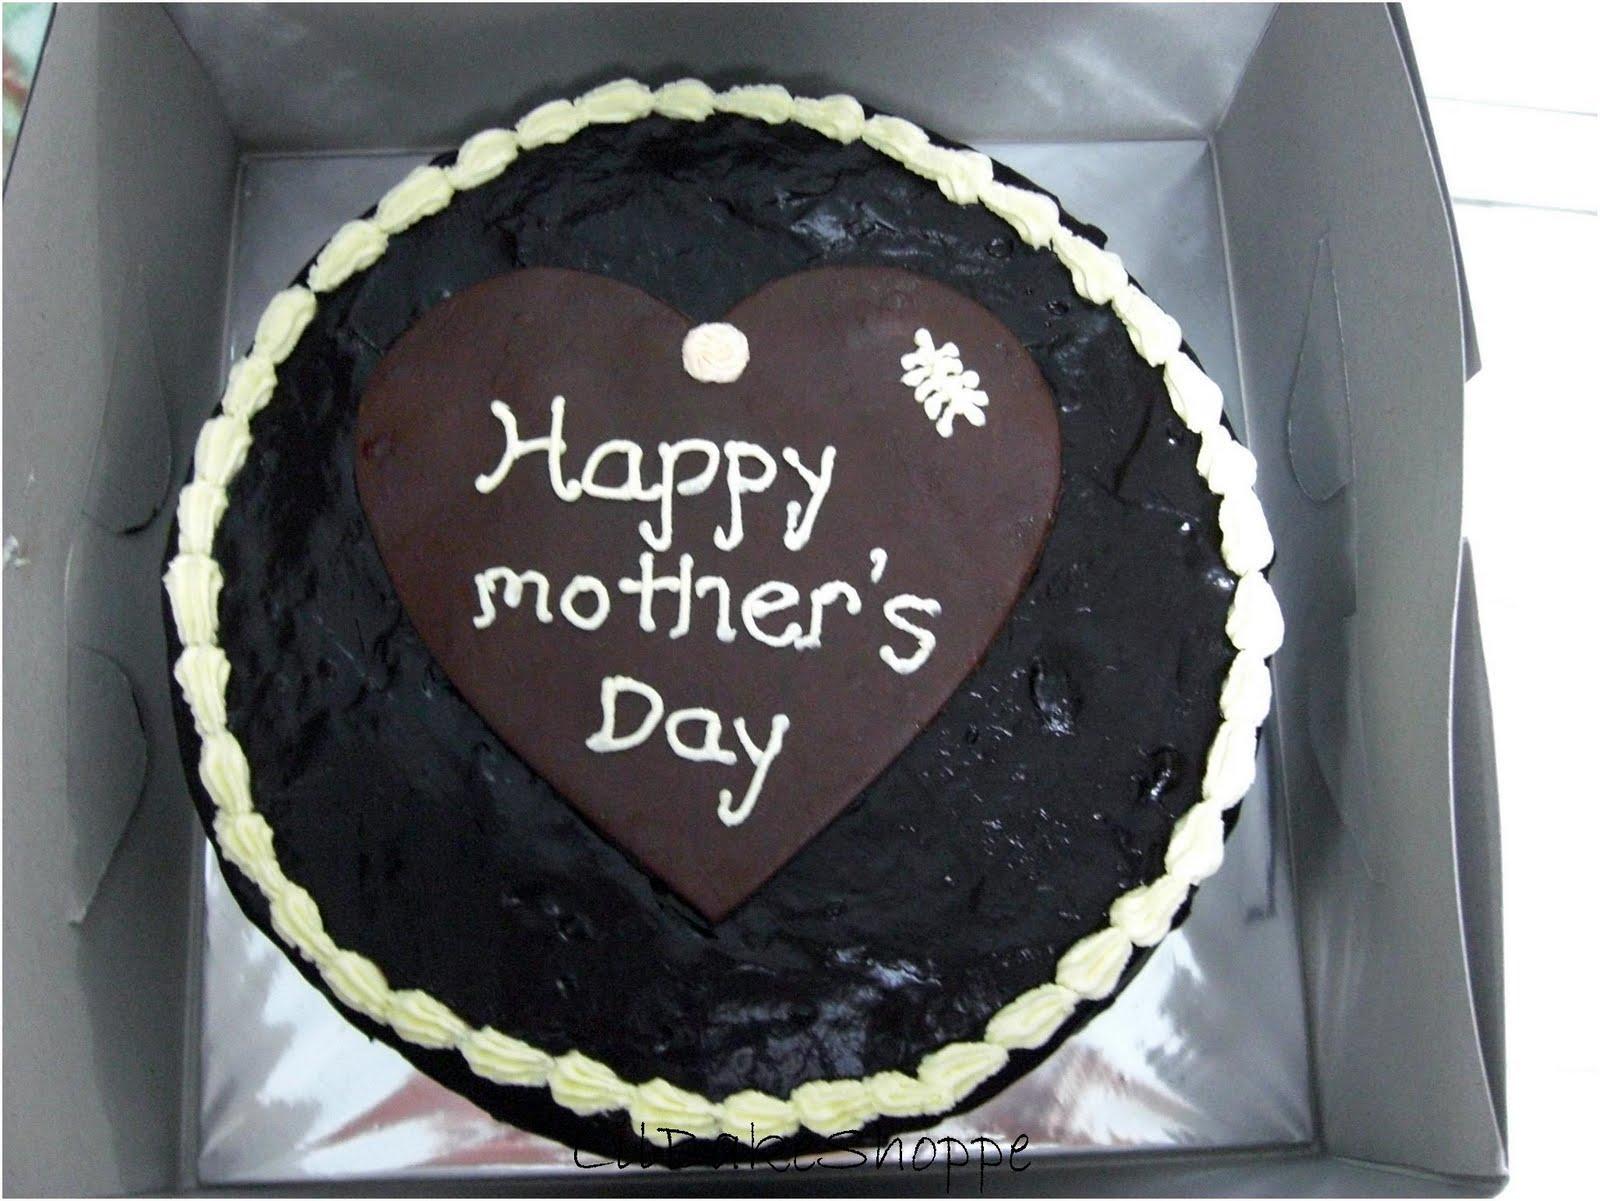 Happy Mothers Day Chocolate Fudge Cake